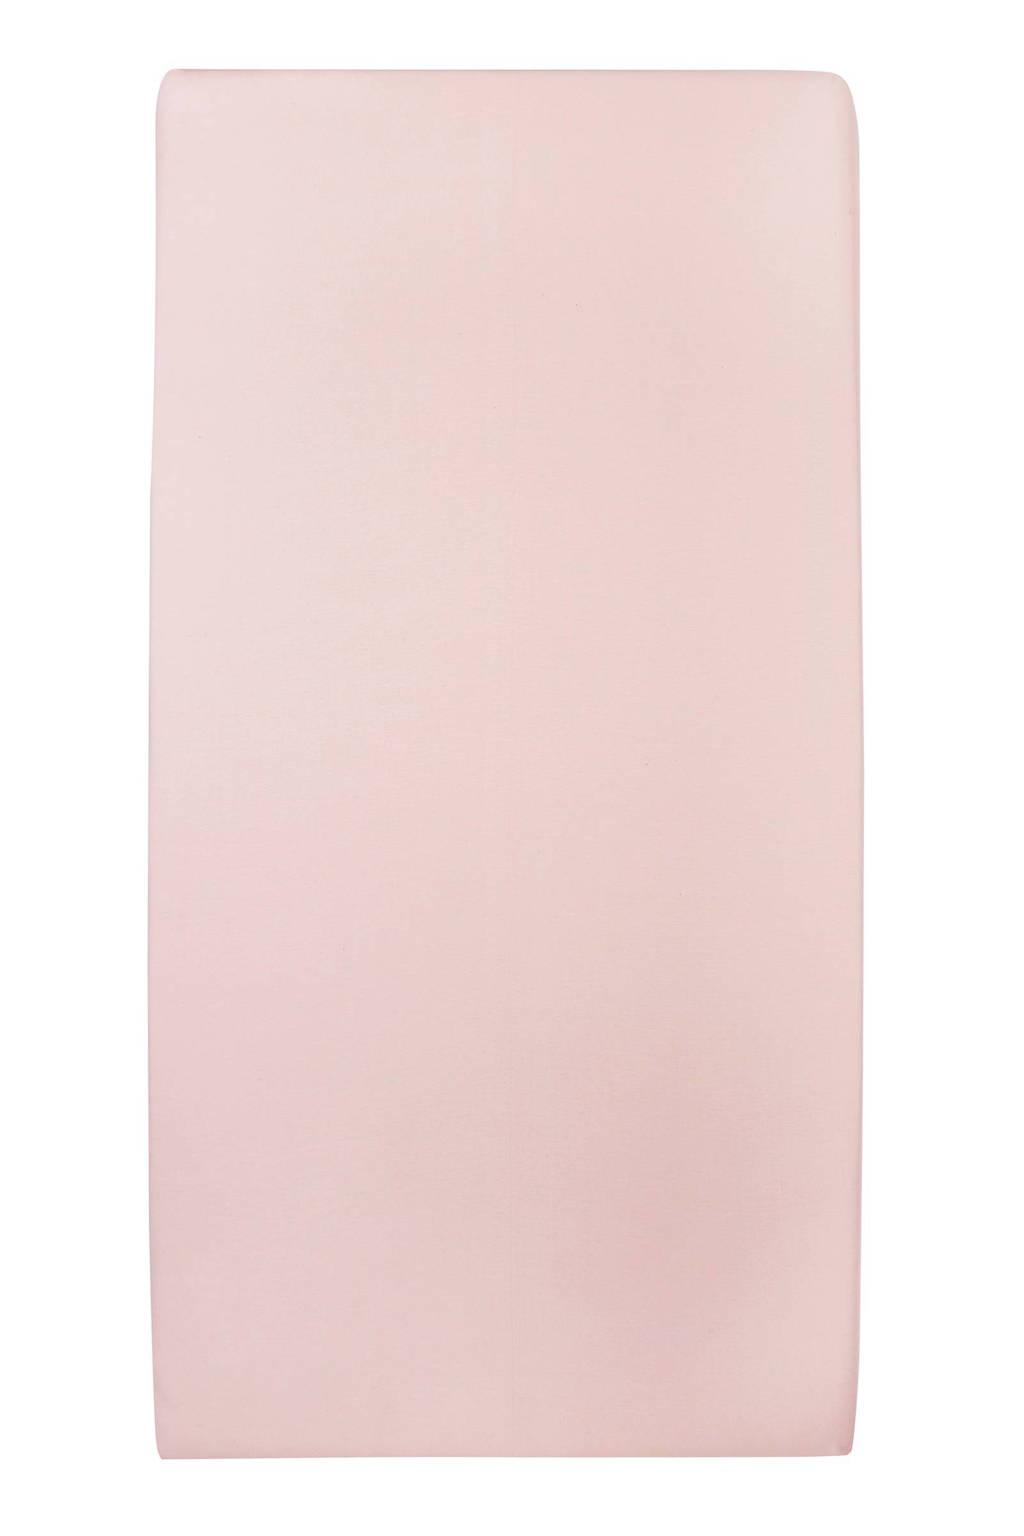 Meyco jersey hoeslaken peuterbed 70x140/150 cm Lichtroze